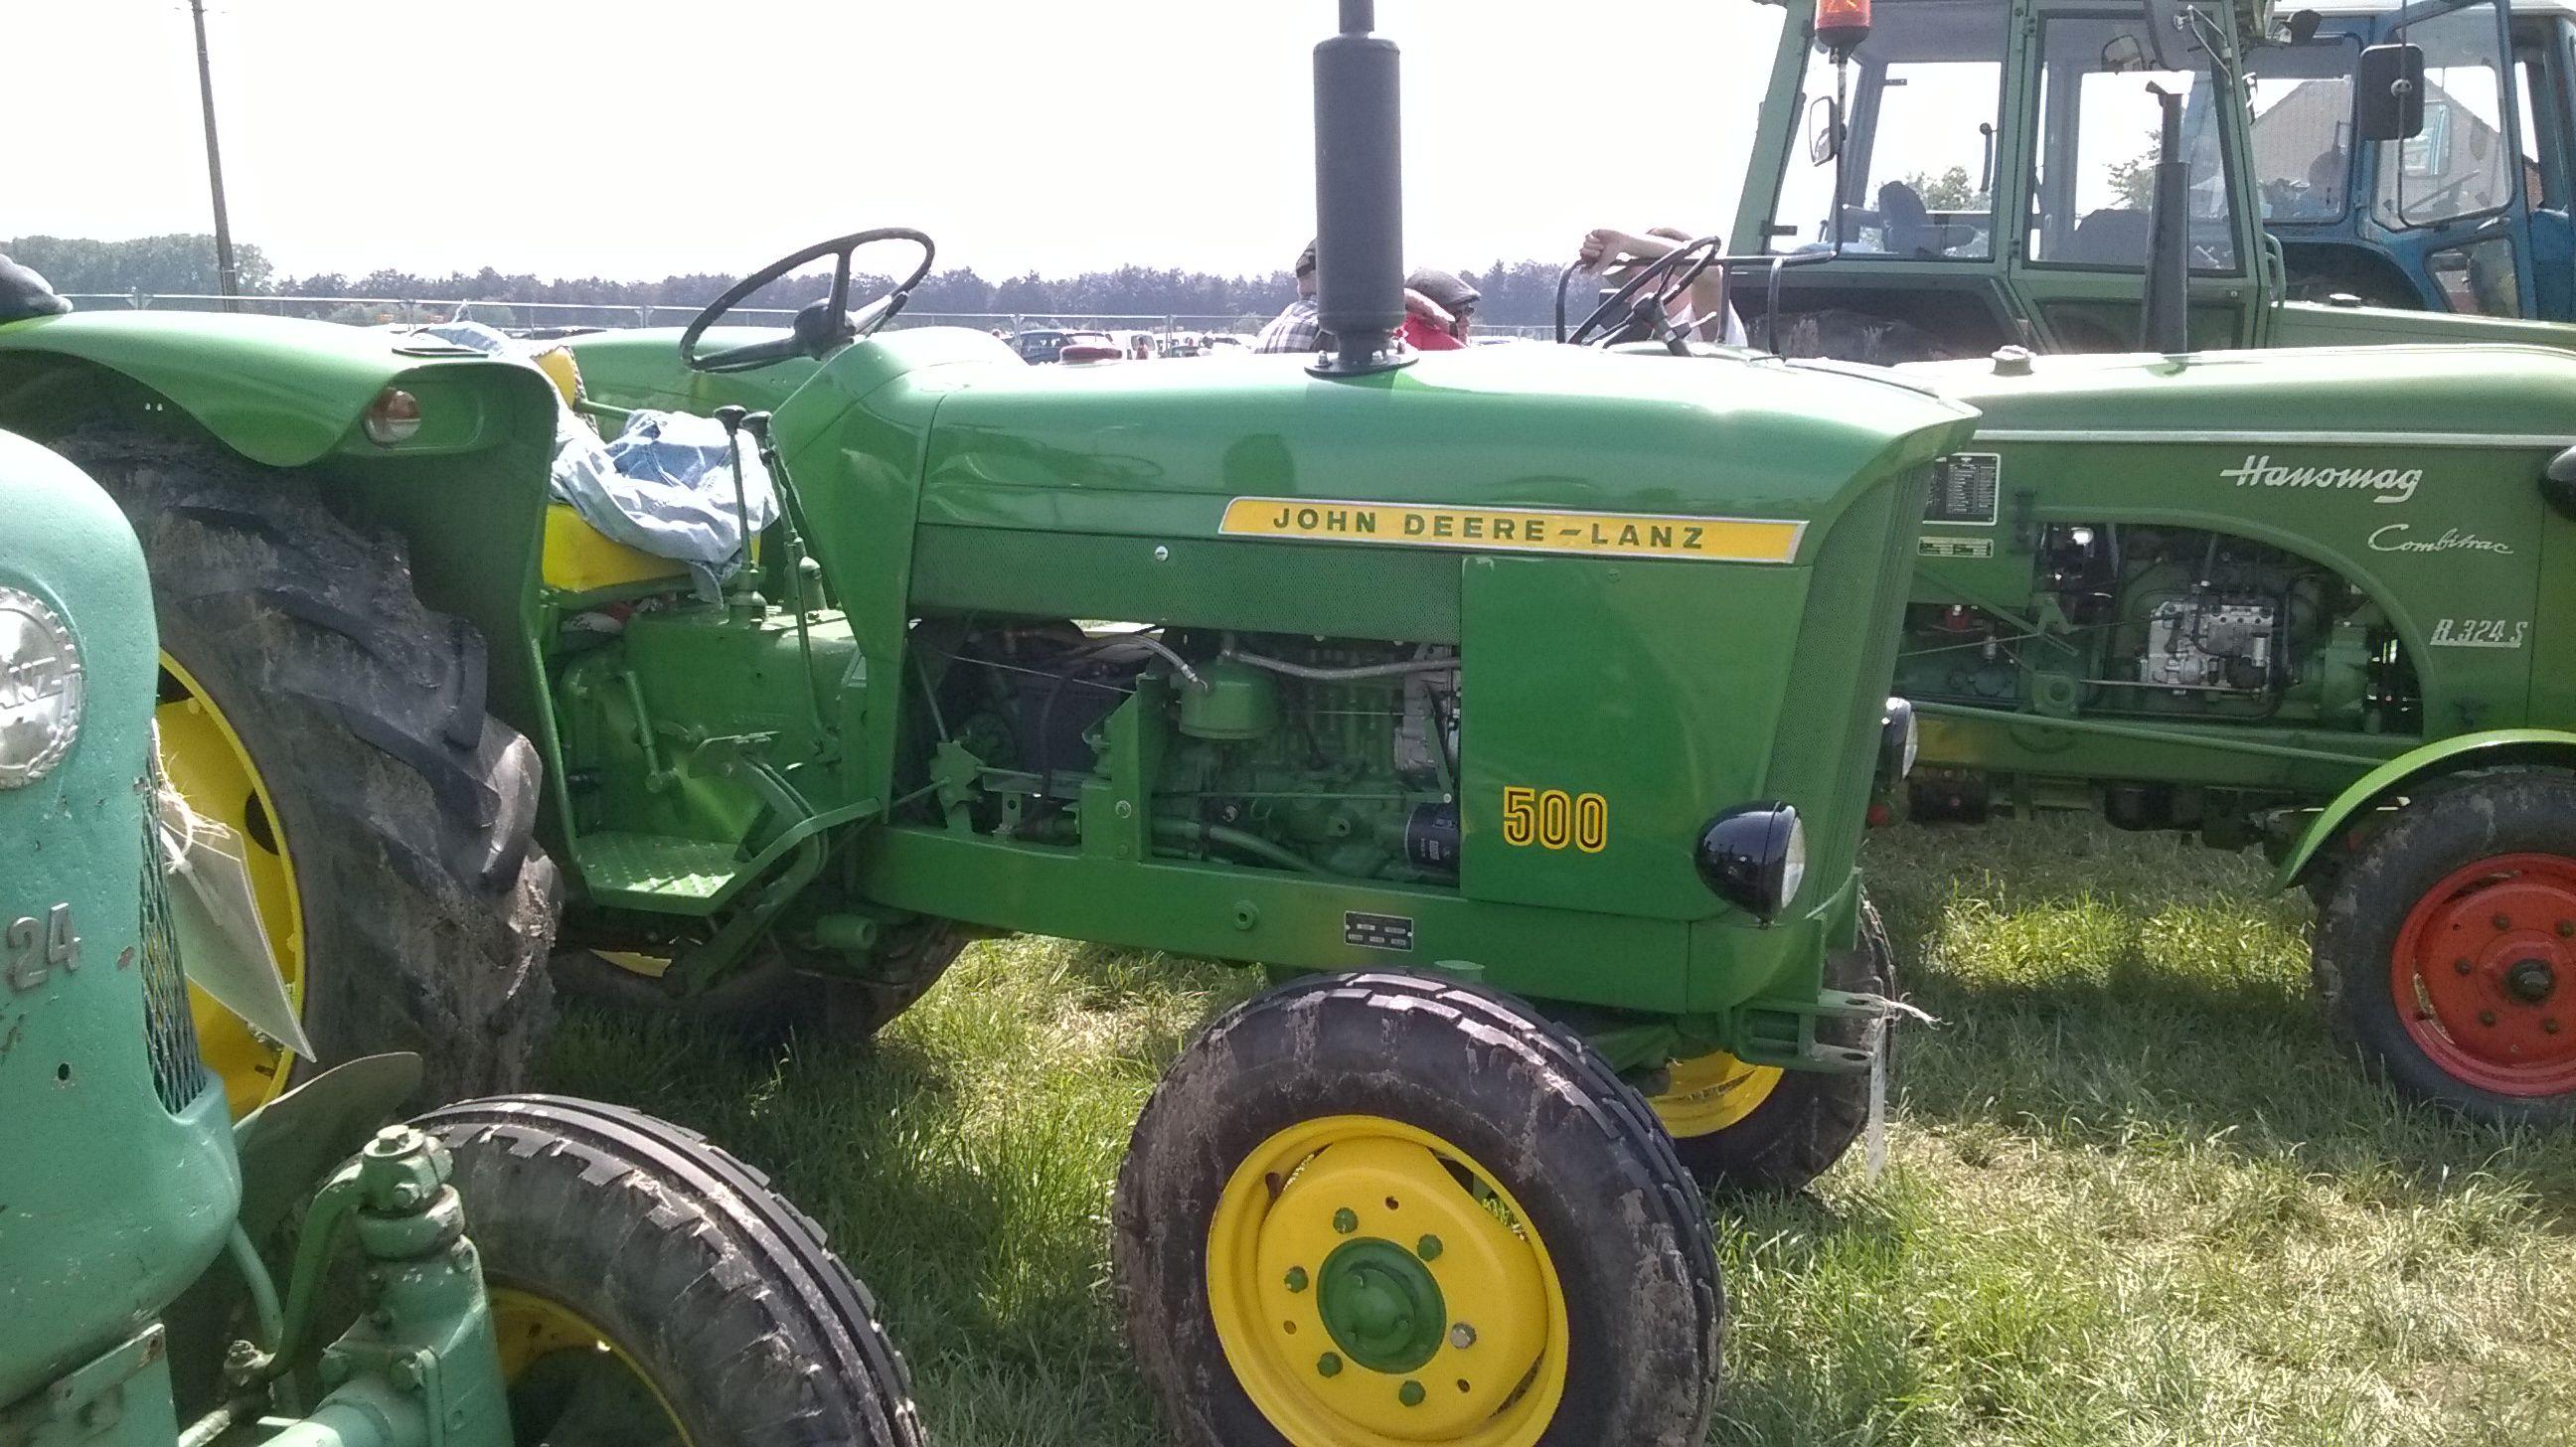 john deere - lanz 500 Mean Green, Classic Tractor, John Deere Equipment,  Seed